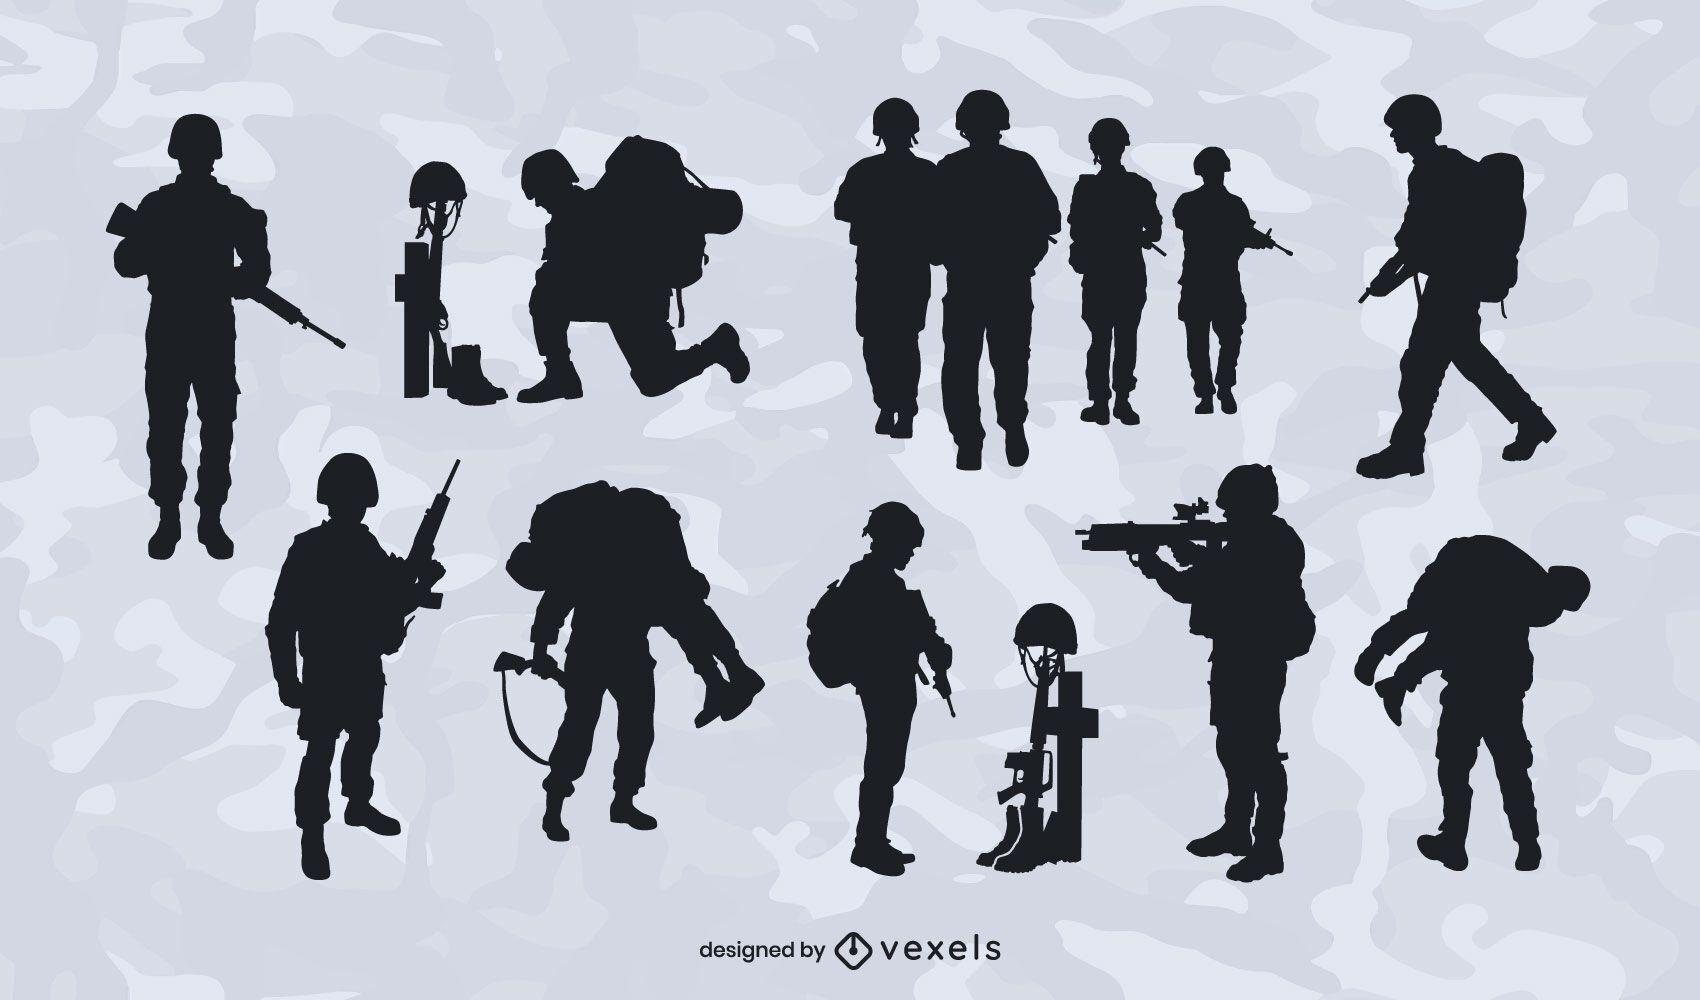 UK military silhouette set